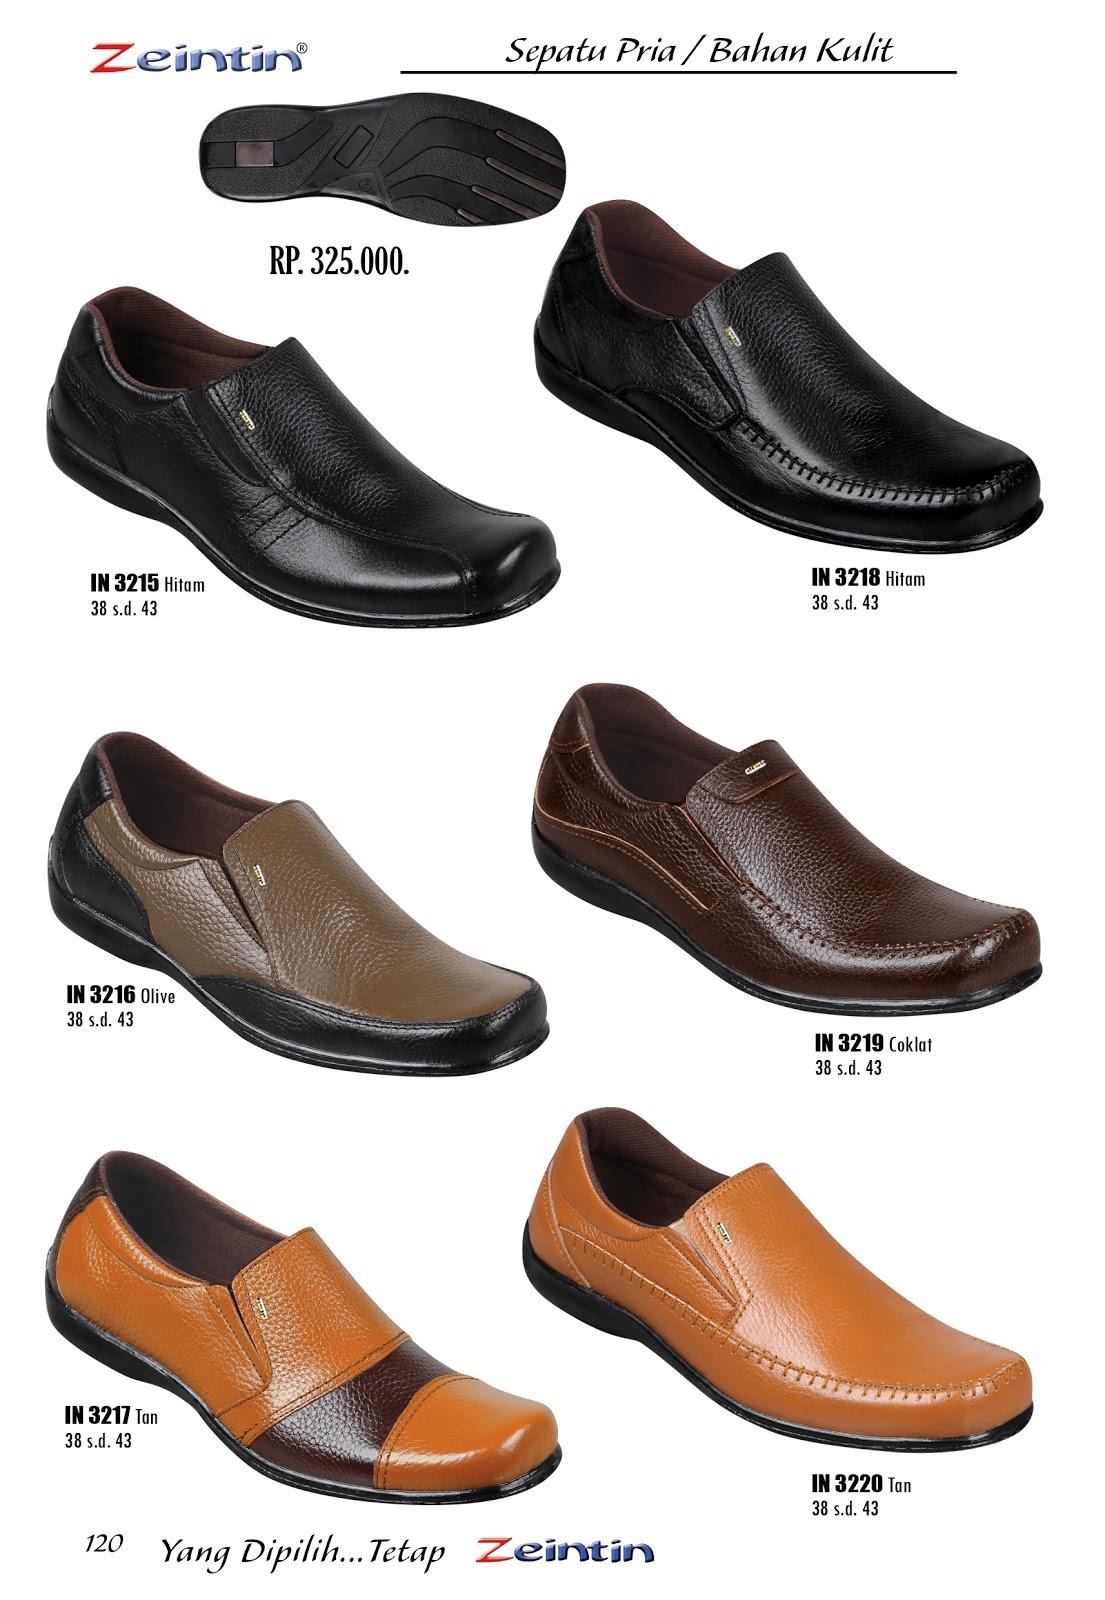 Sepatu Gaul Pria Toko Zeintin Tangerang